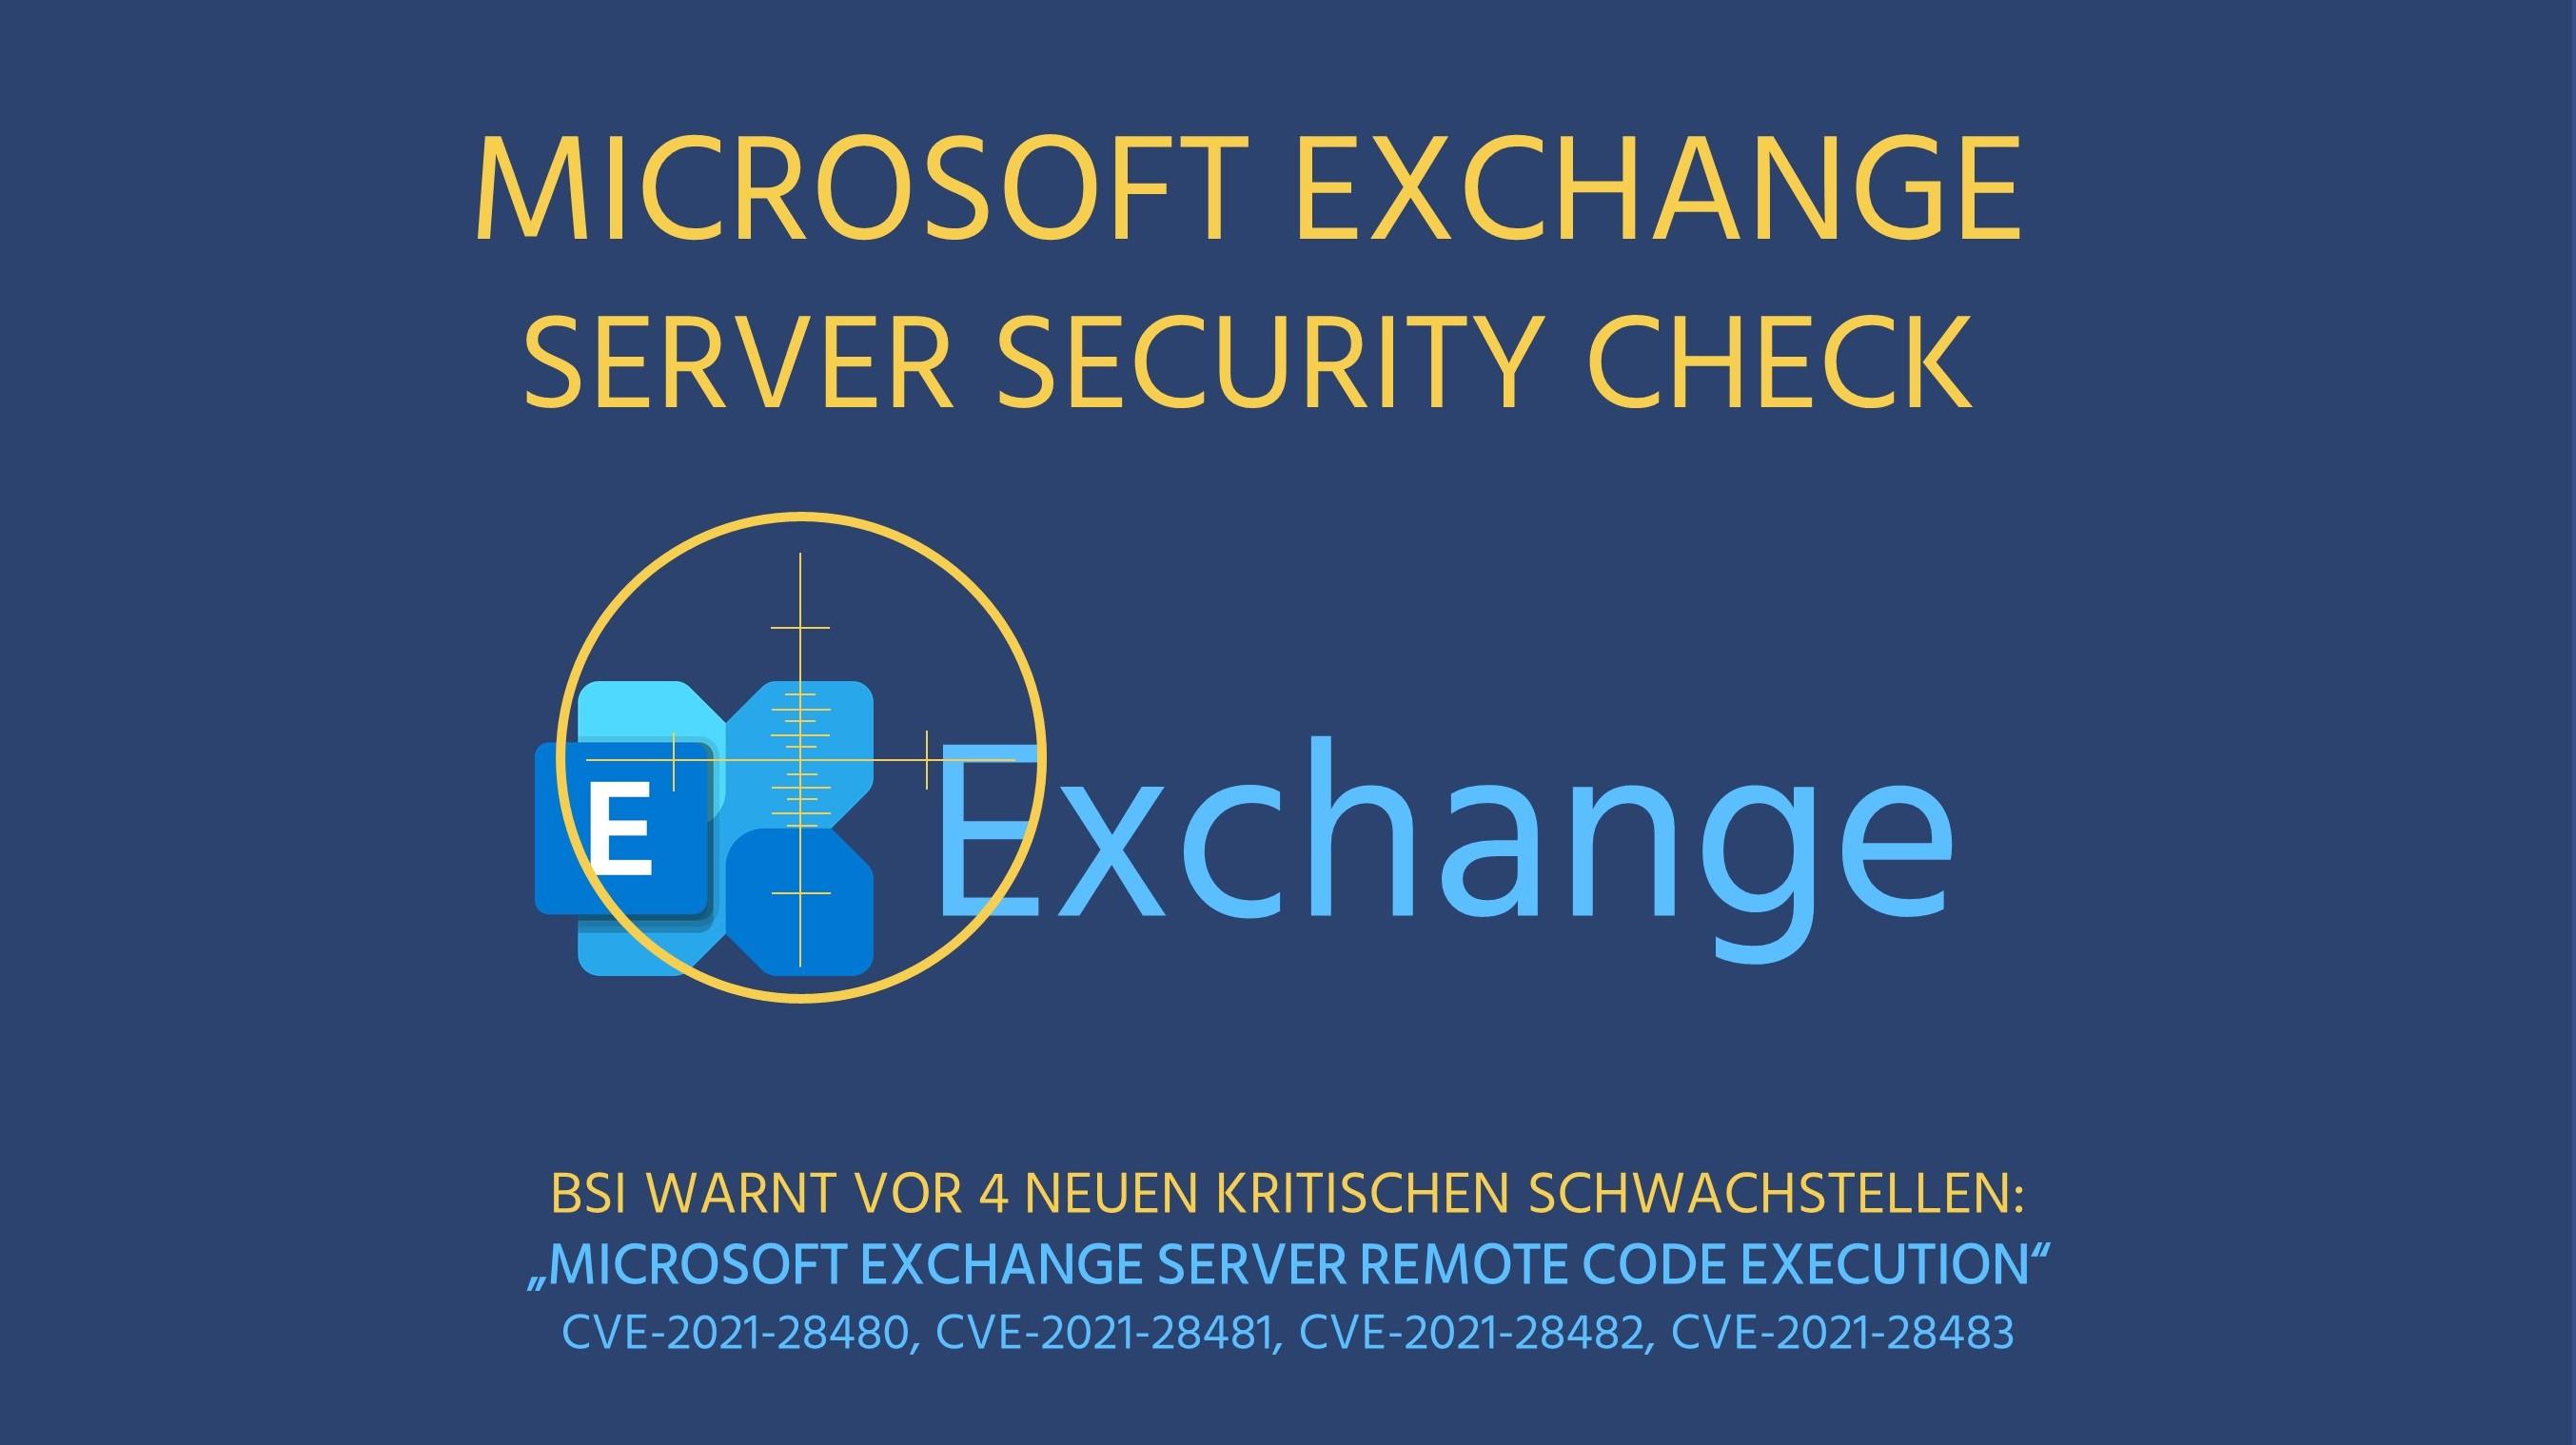 Microsoft Exchange Server Security Check